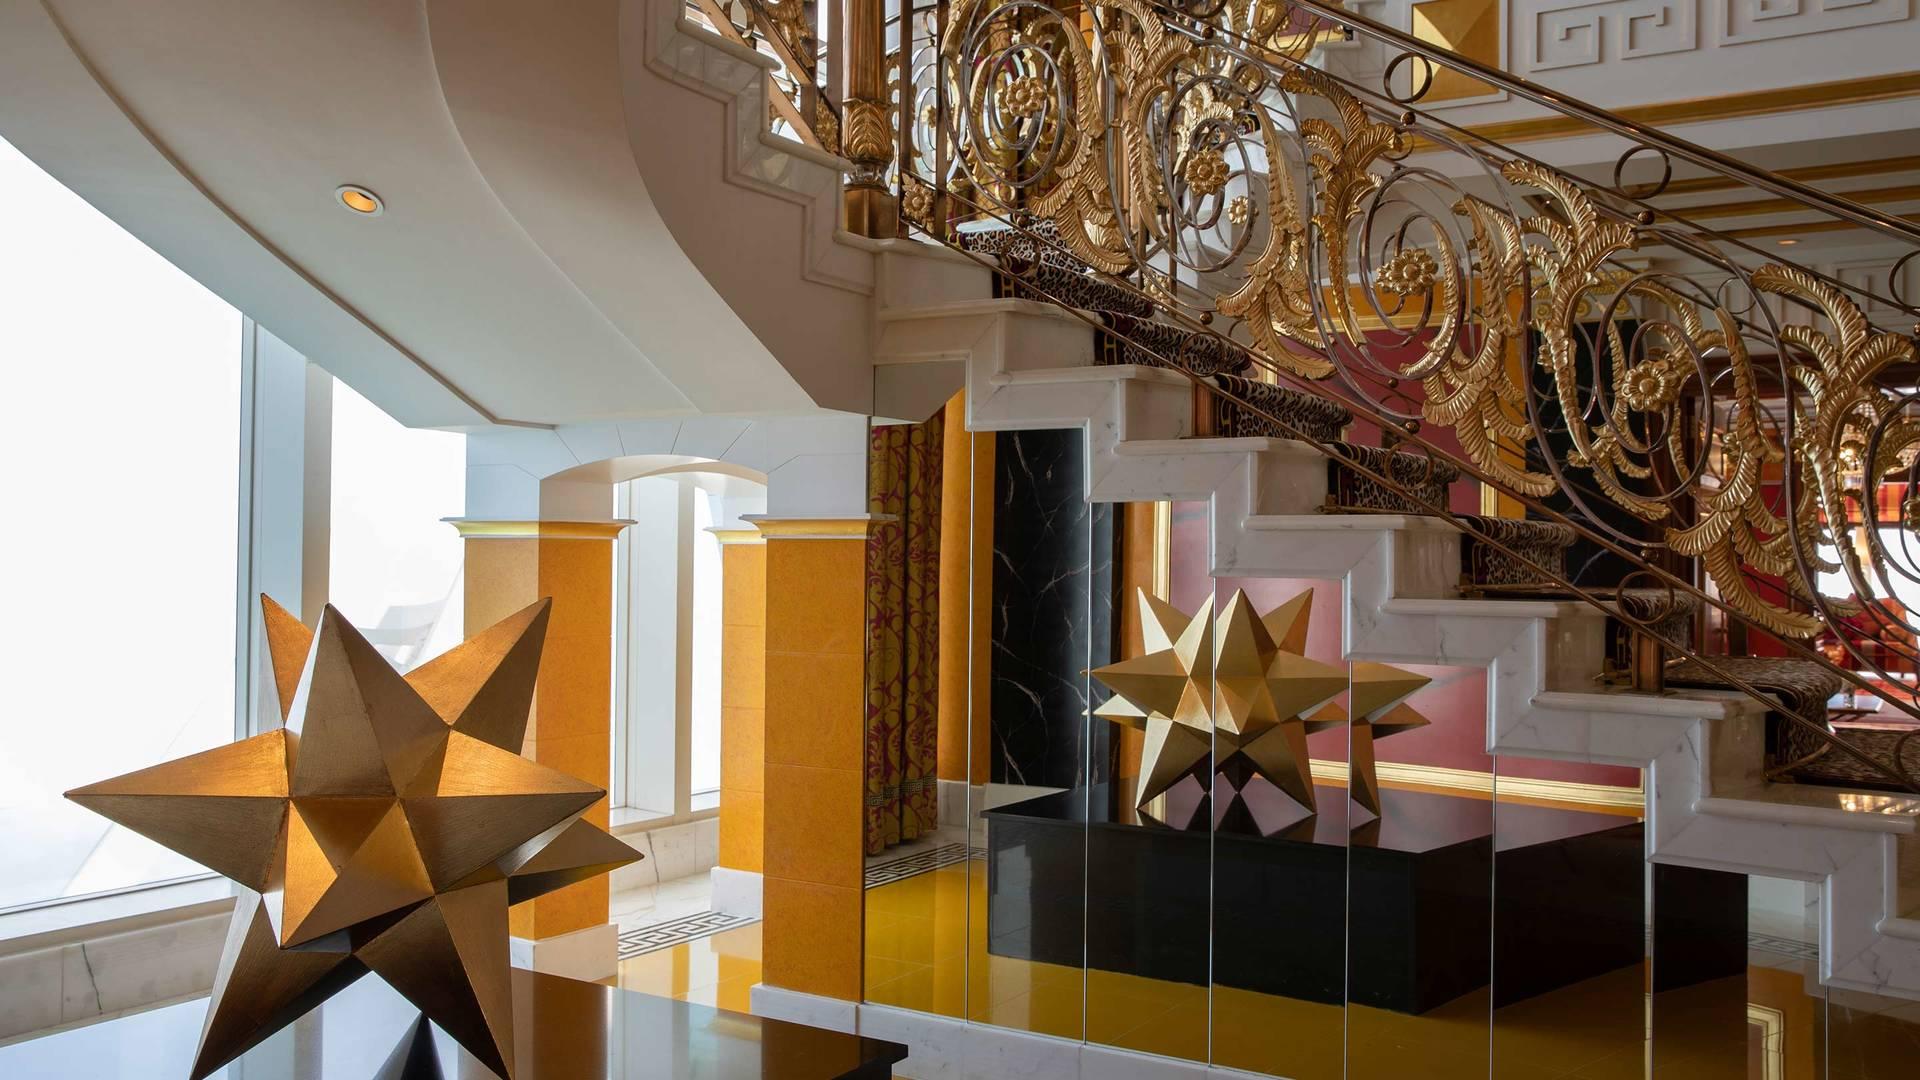 Jumeirah Burj Al Arab royal suite staircase detail_16-9